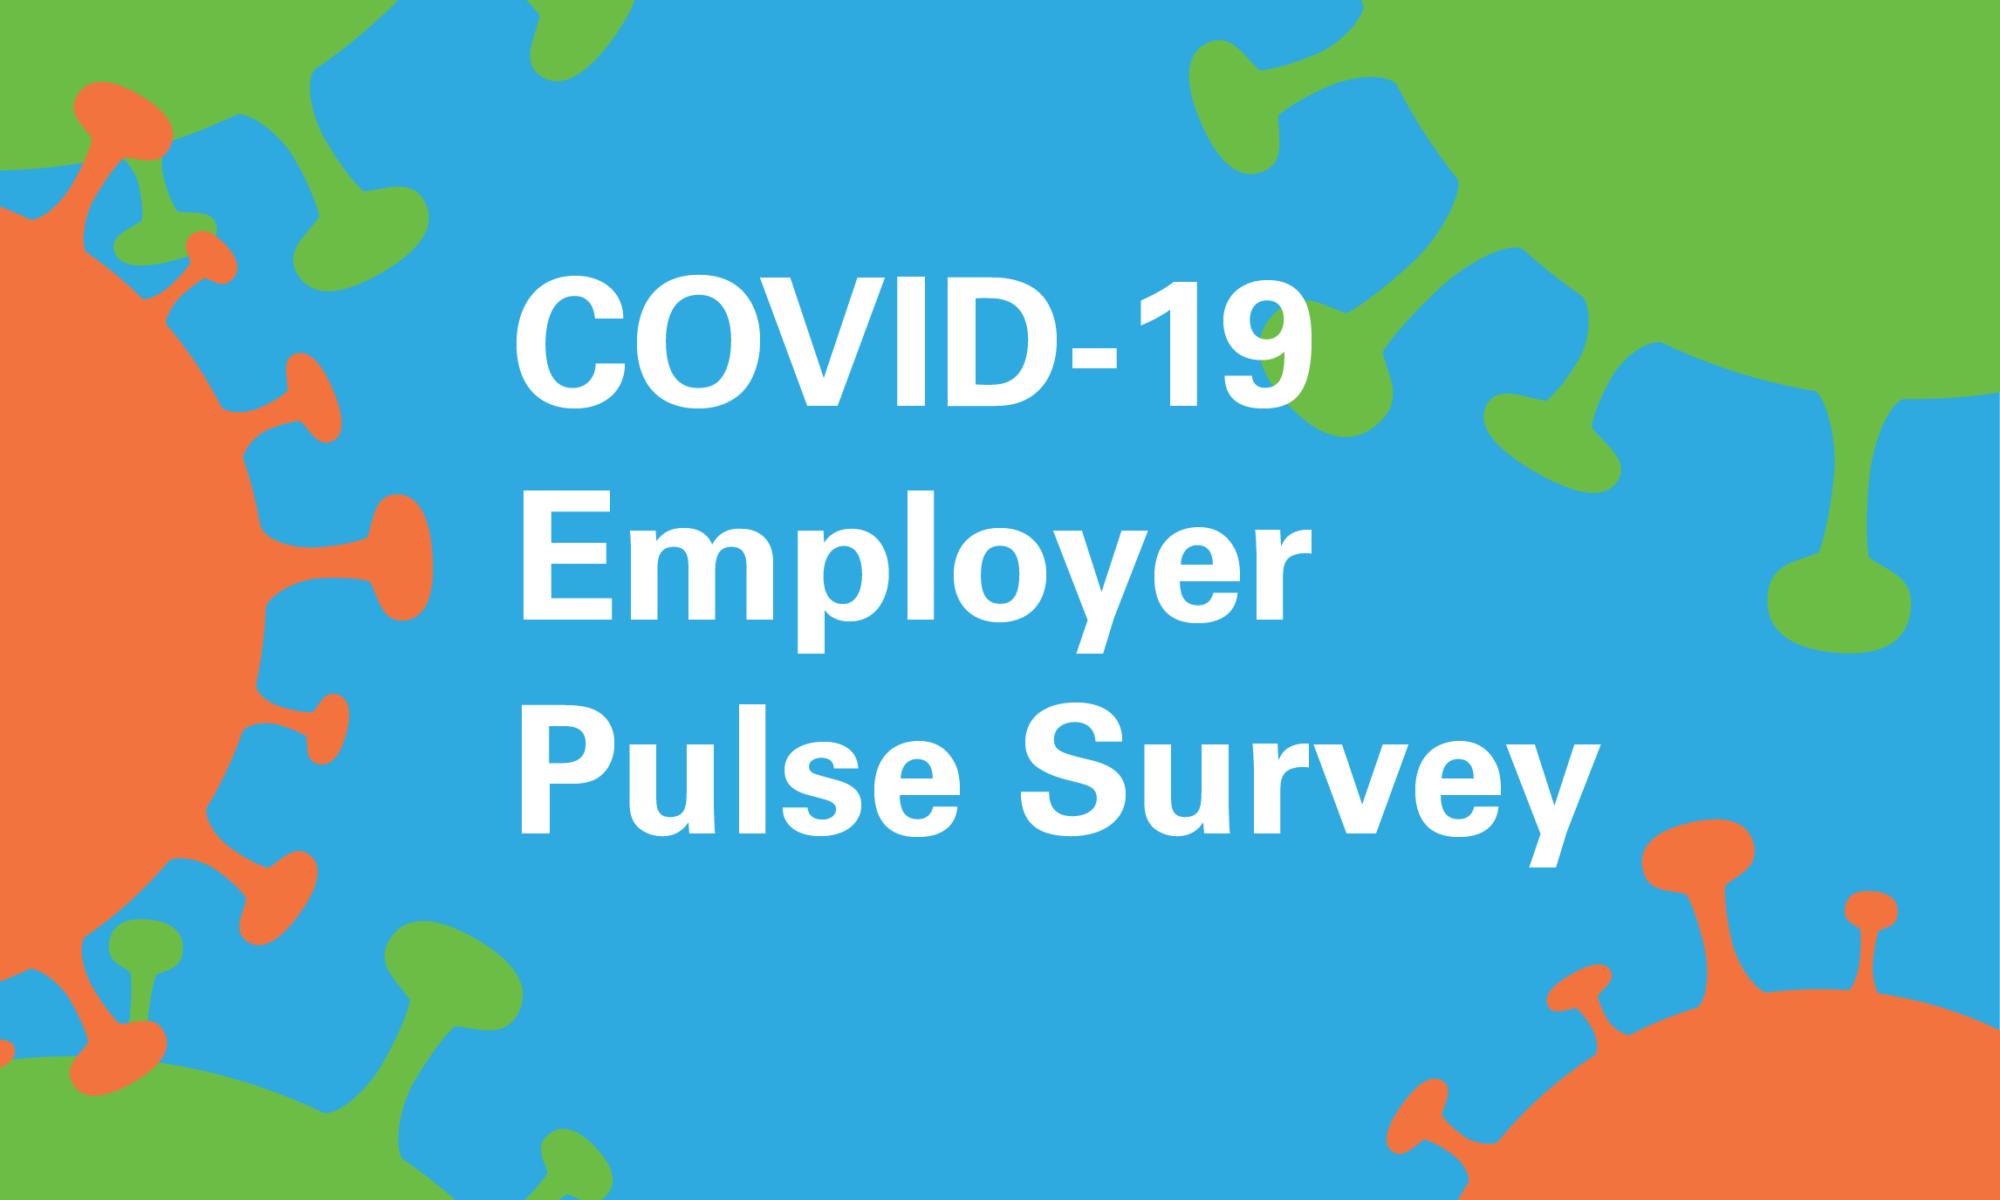 covid-19 employer pulse survey